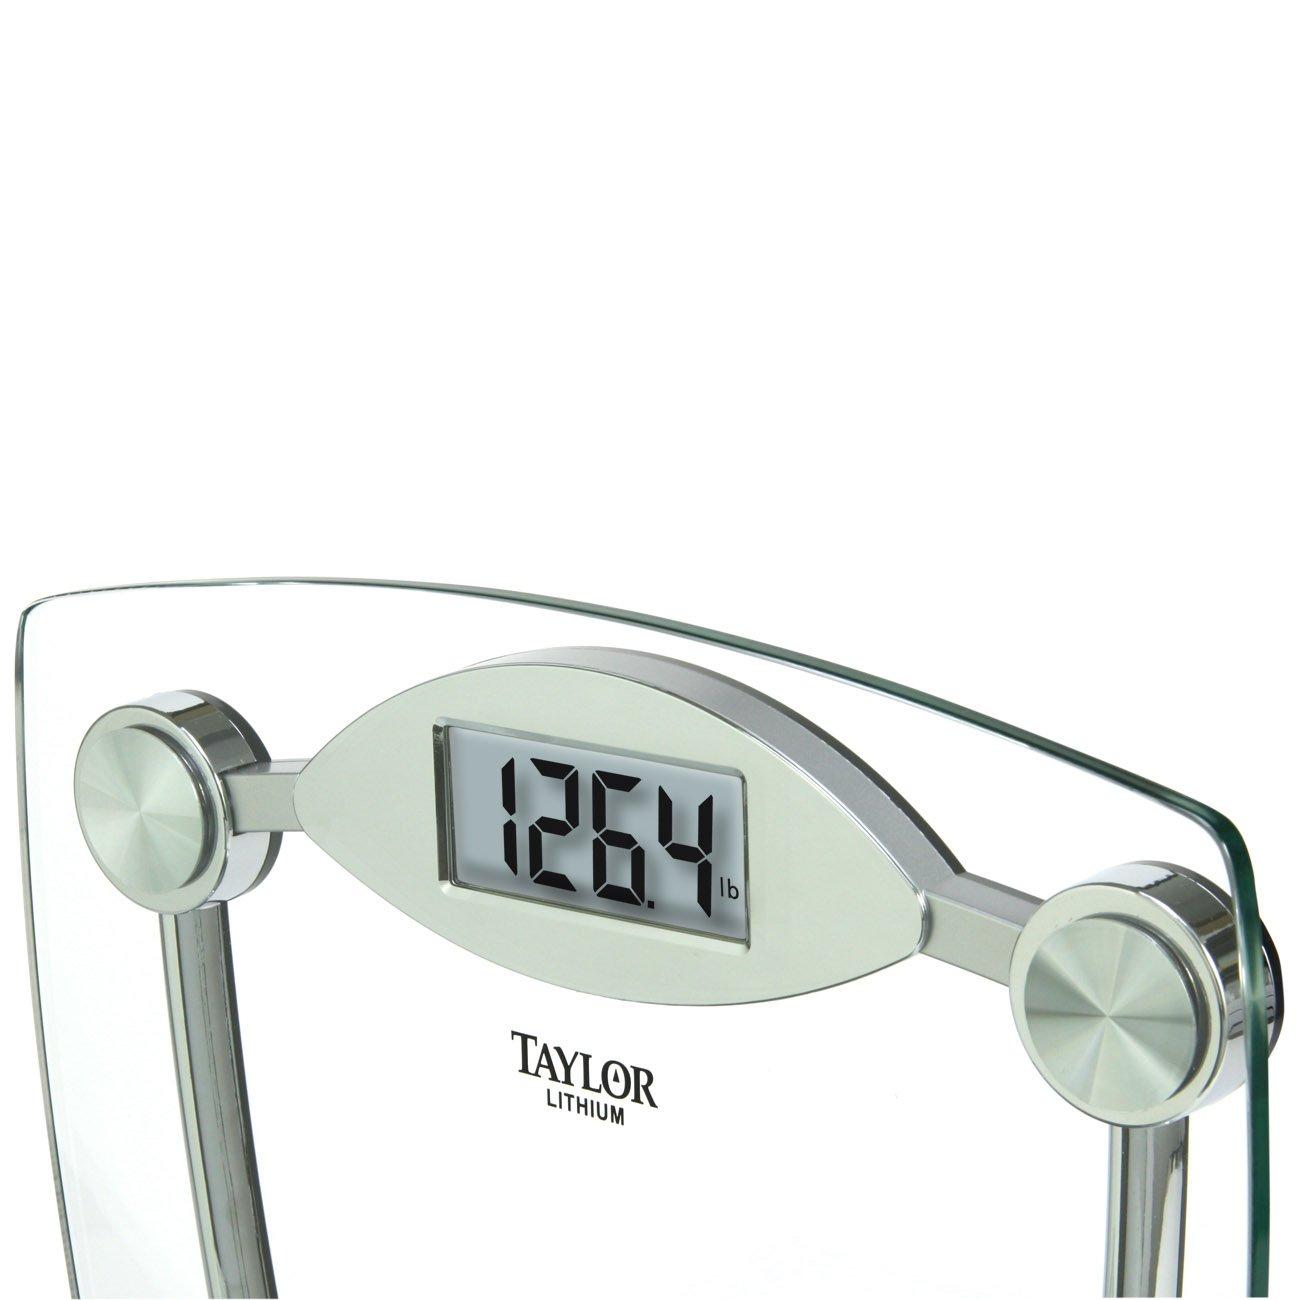 Taylor Glass And Chrome Digital Bathroom Scale 400 Lb Capacity Ebay